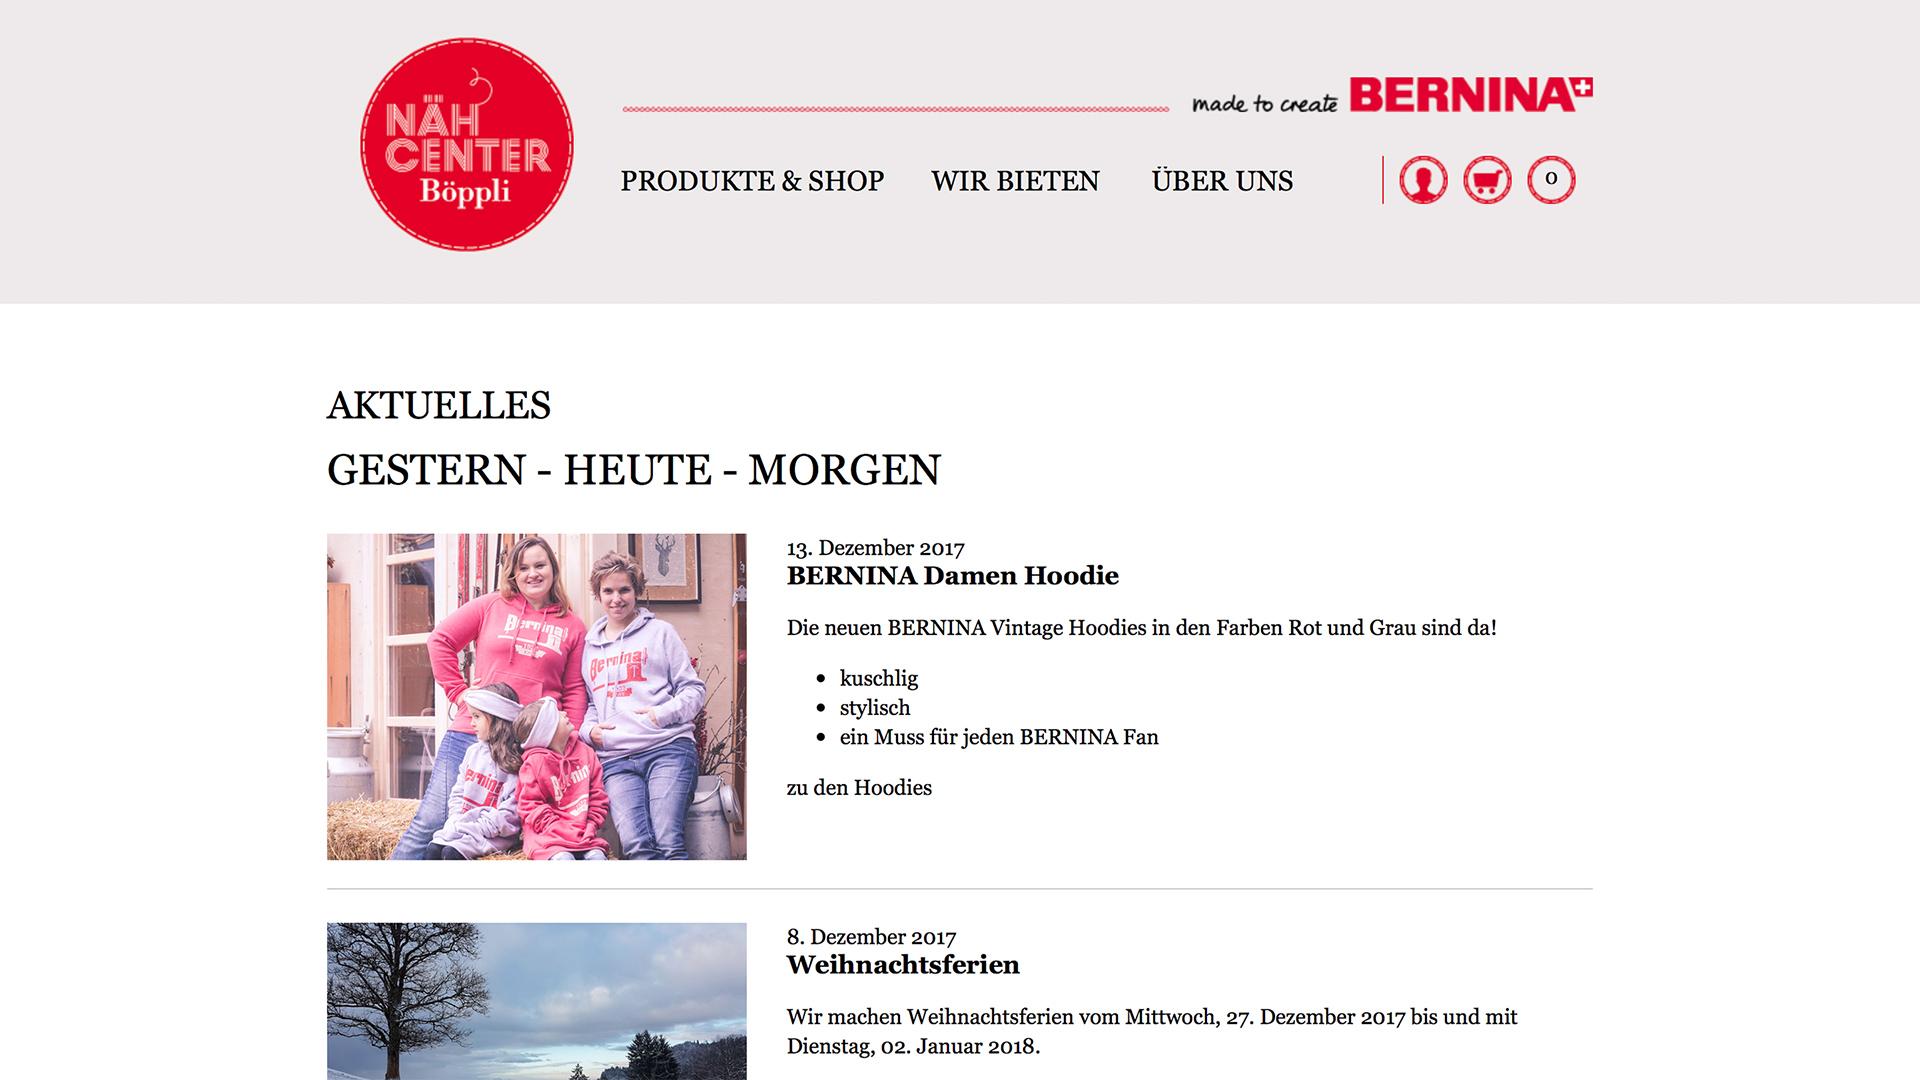 Bild 1 vom Böppli Nähcenter Online-Shop